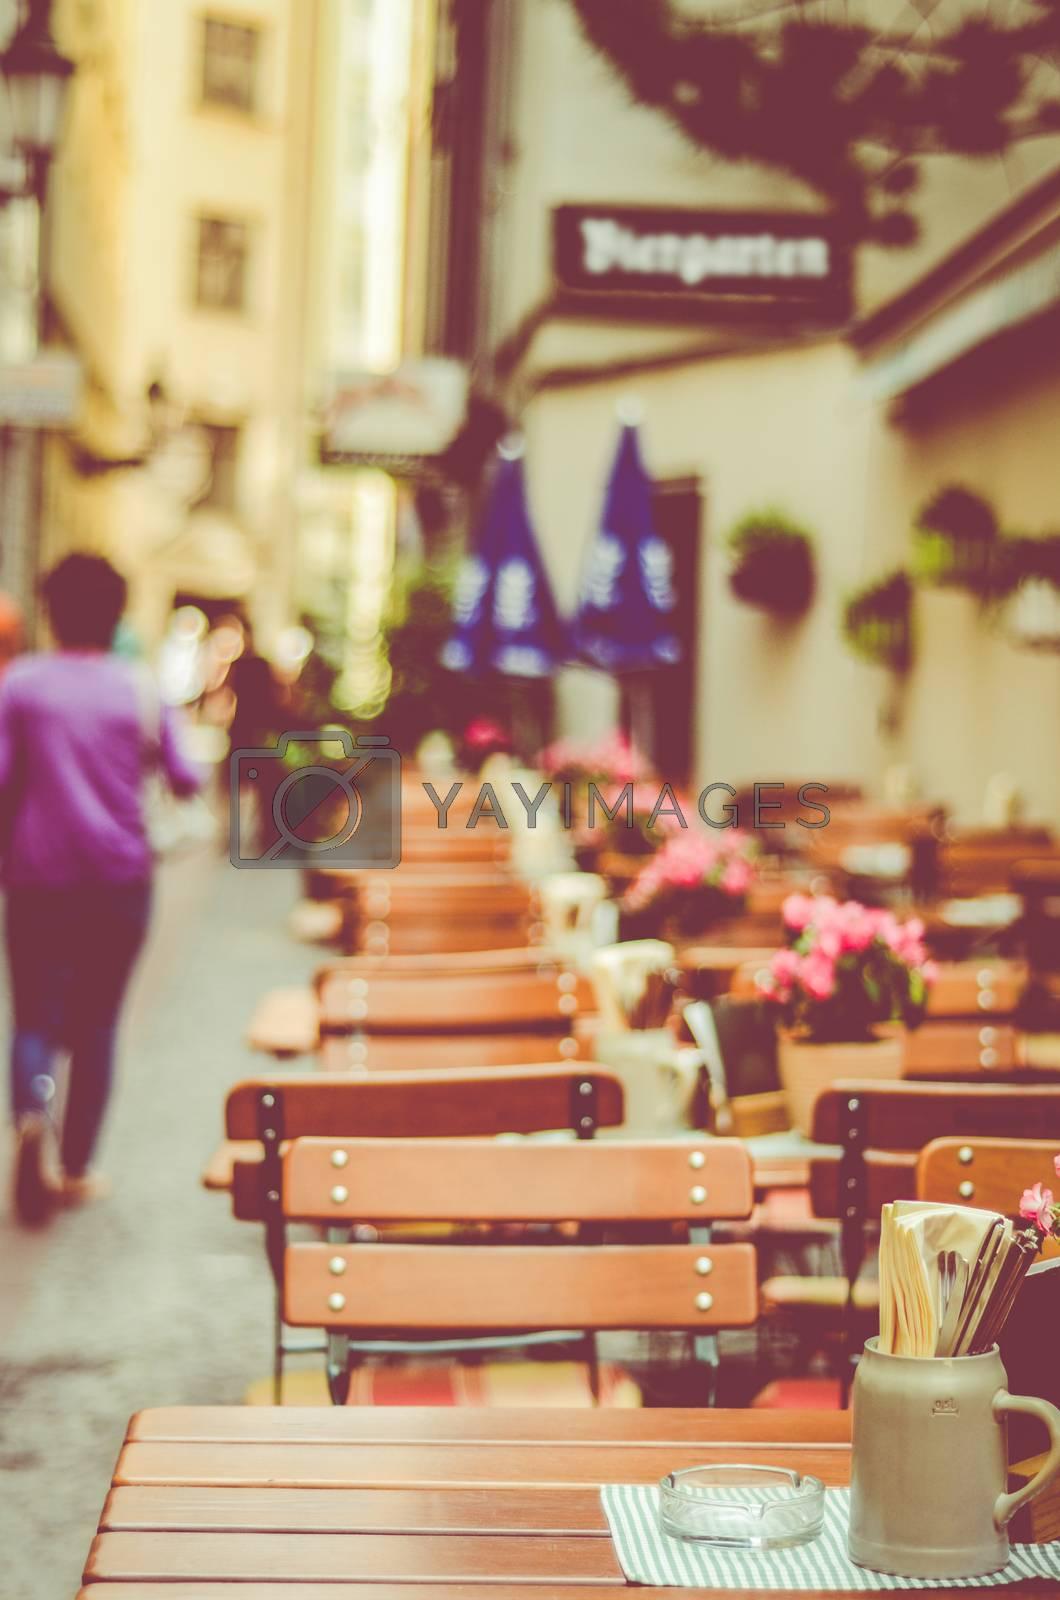 Beer Garden Or Sidewalk Cafe In A European City